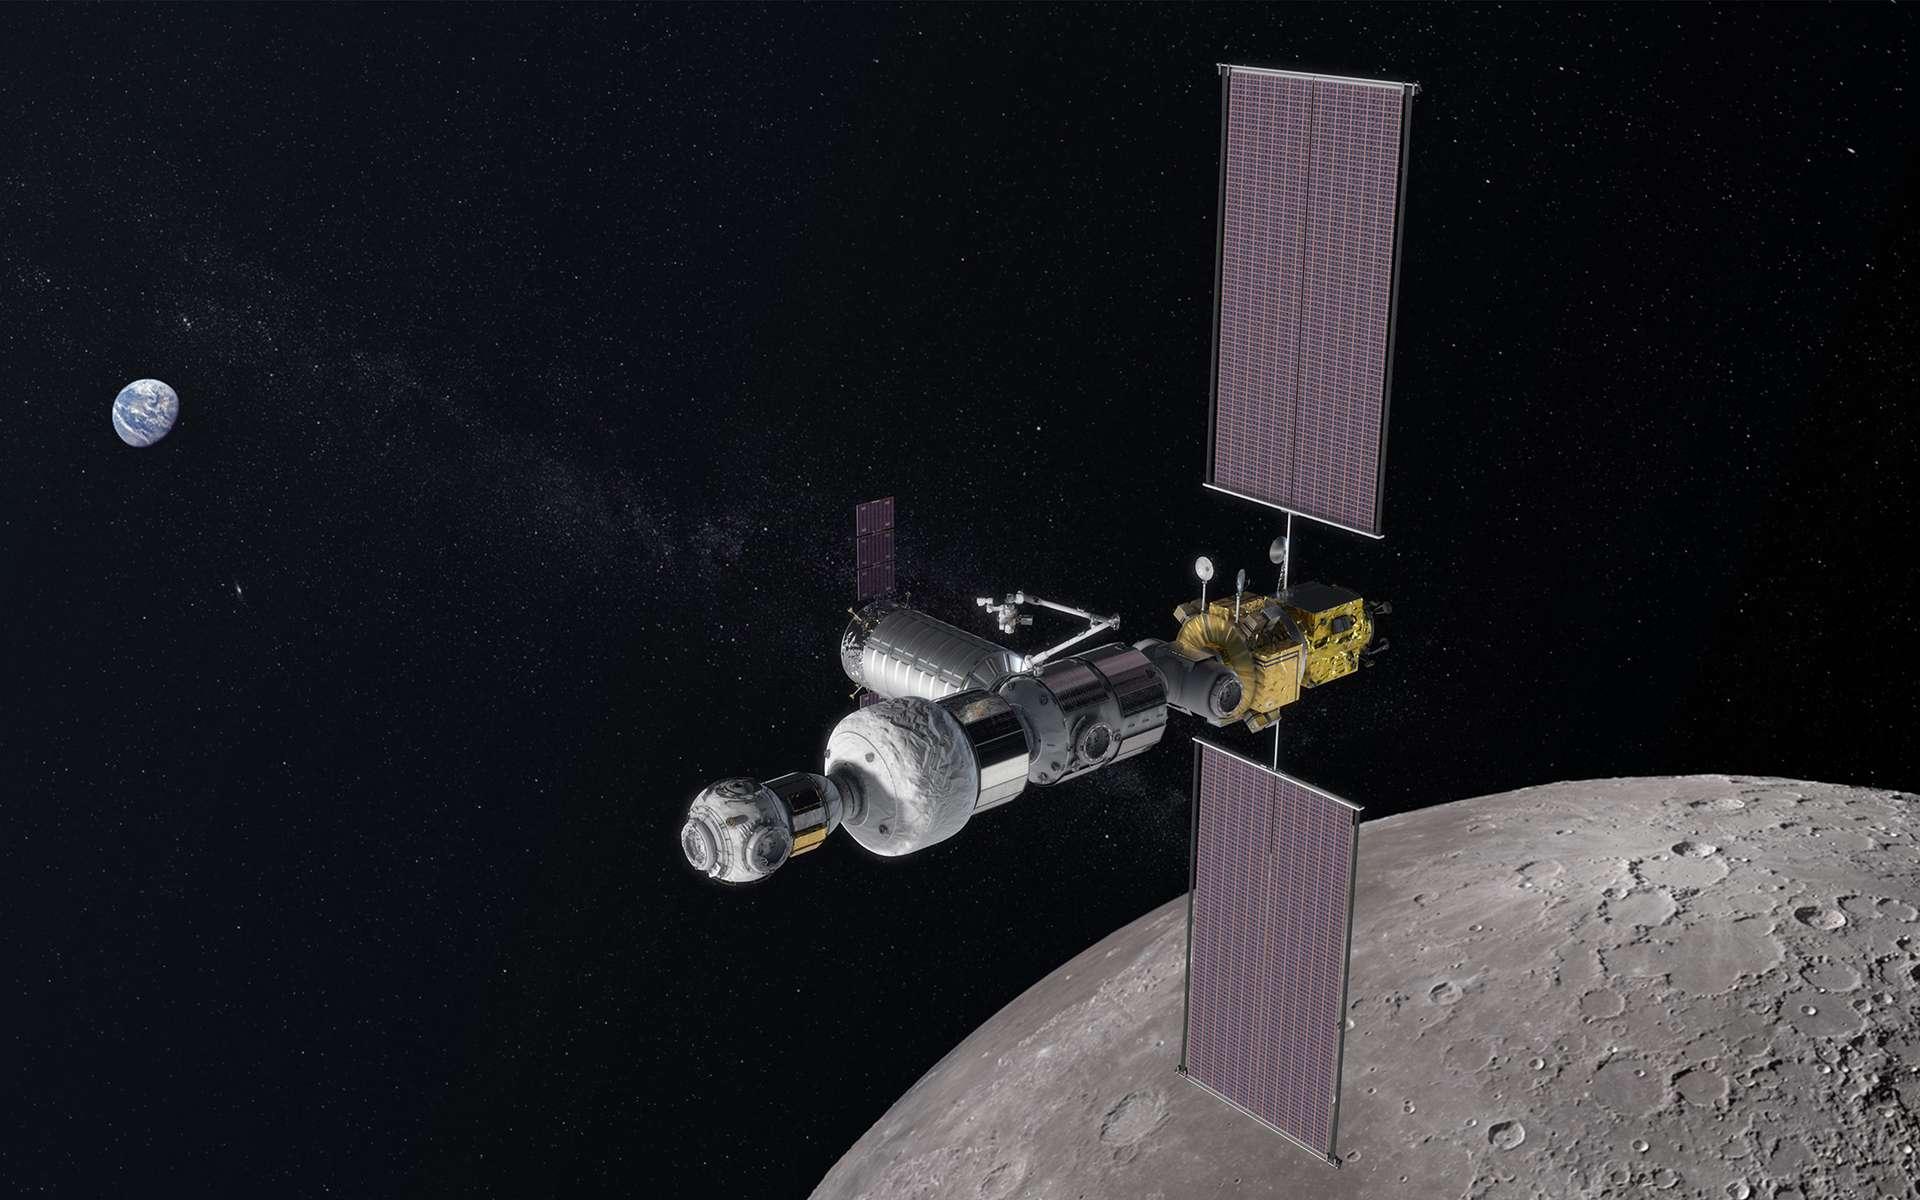 Nasa : la Station lunaire internationale aura du retard - Futura